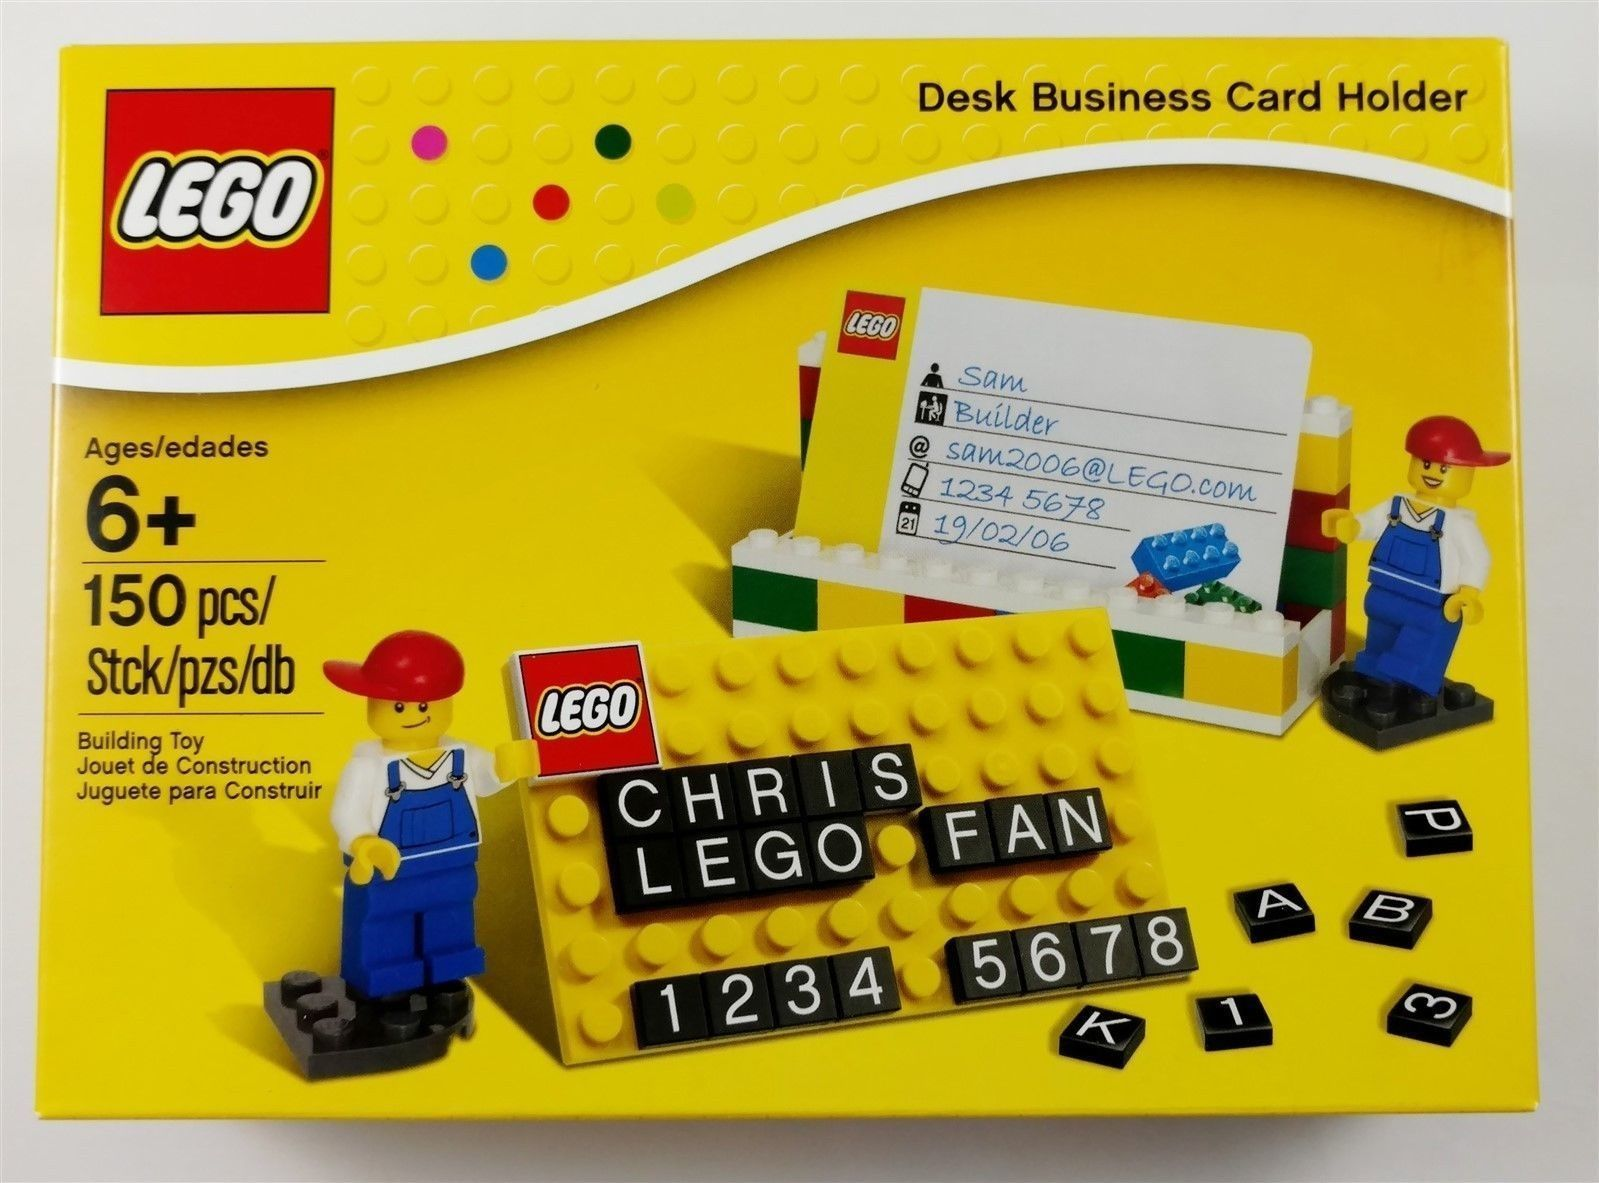 Lego 850425 Desk Business Card Holder Retired NEW NIB Sealed ...